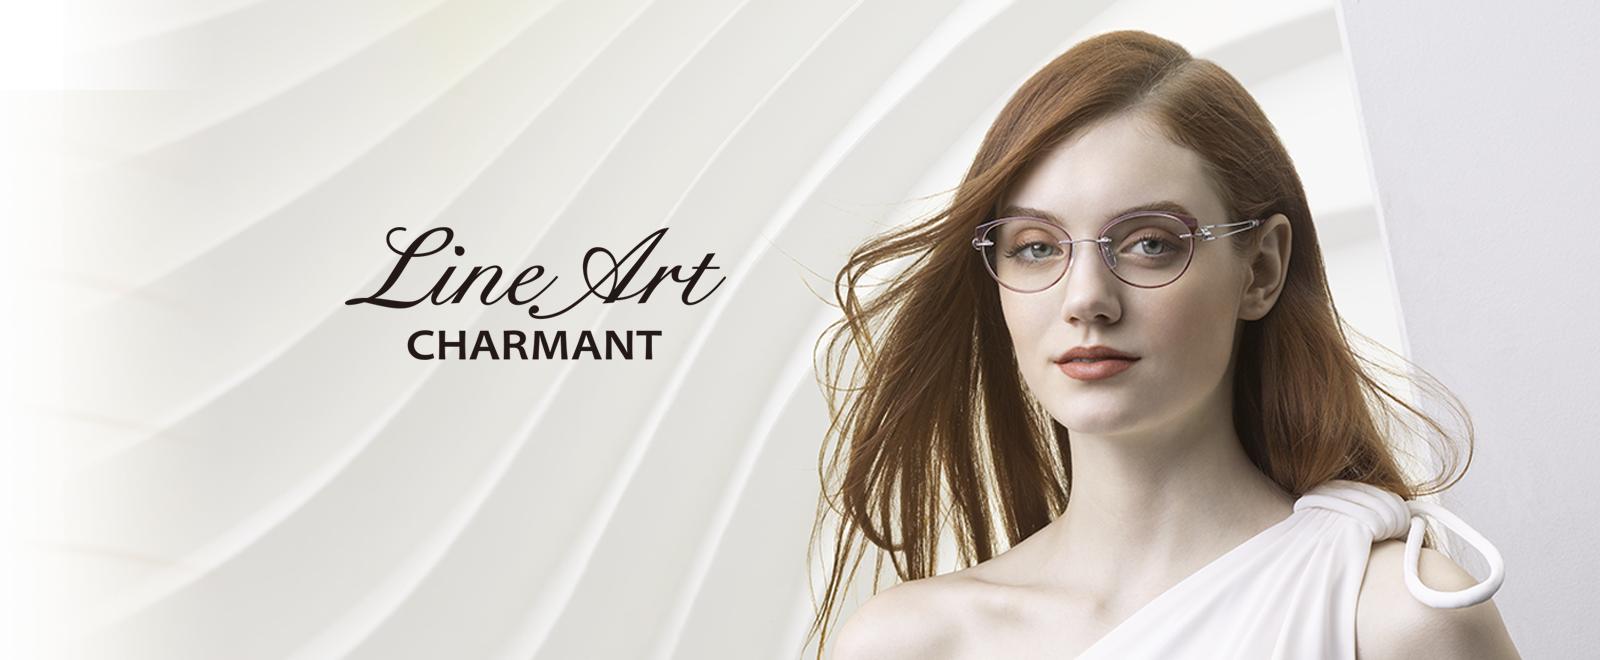 Line Art By Charmant : 【charmant·line】line art charmant toupeenseen部落格